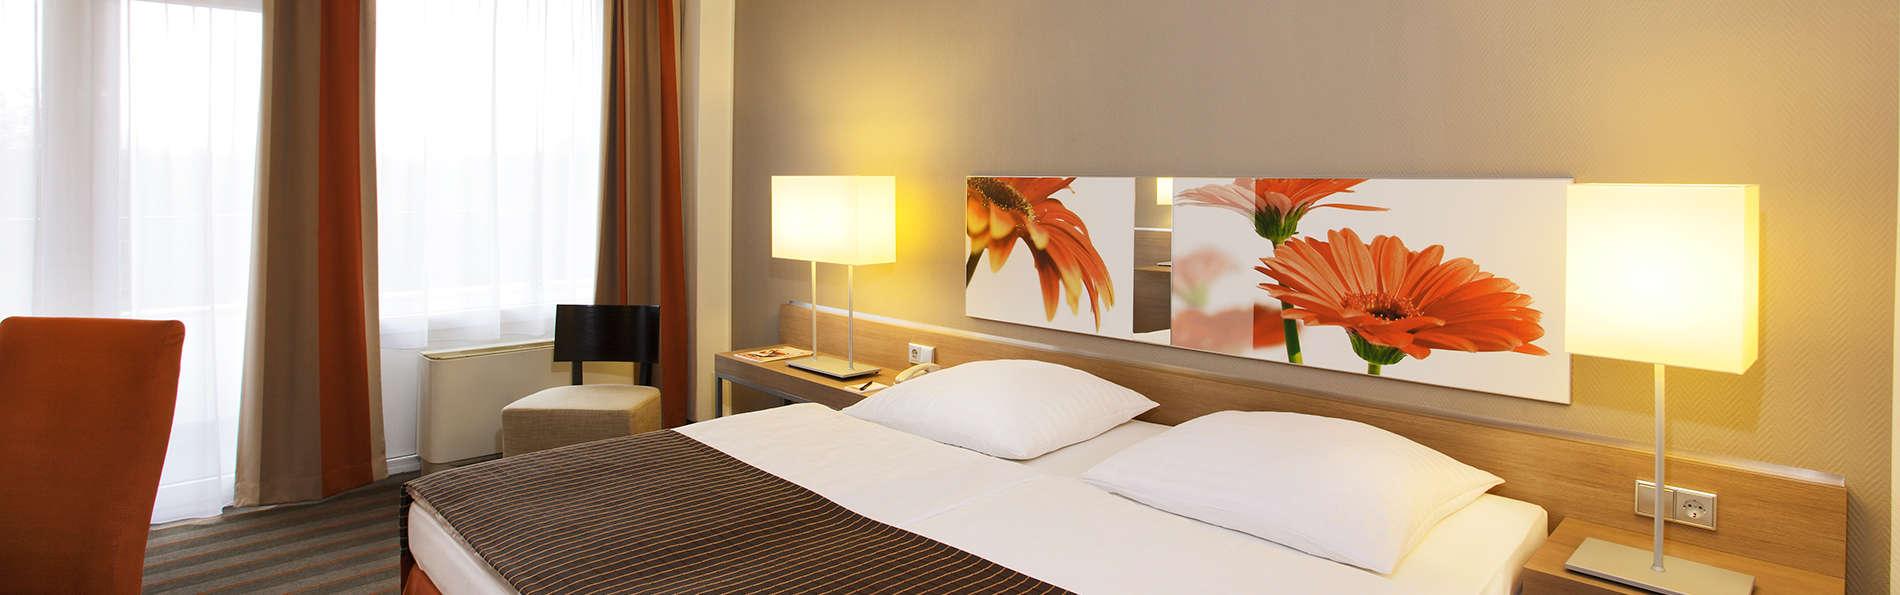 H4 Hotel Frankfurt Messe - EDIT_room.jpg